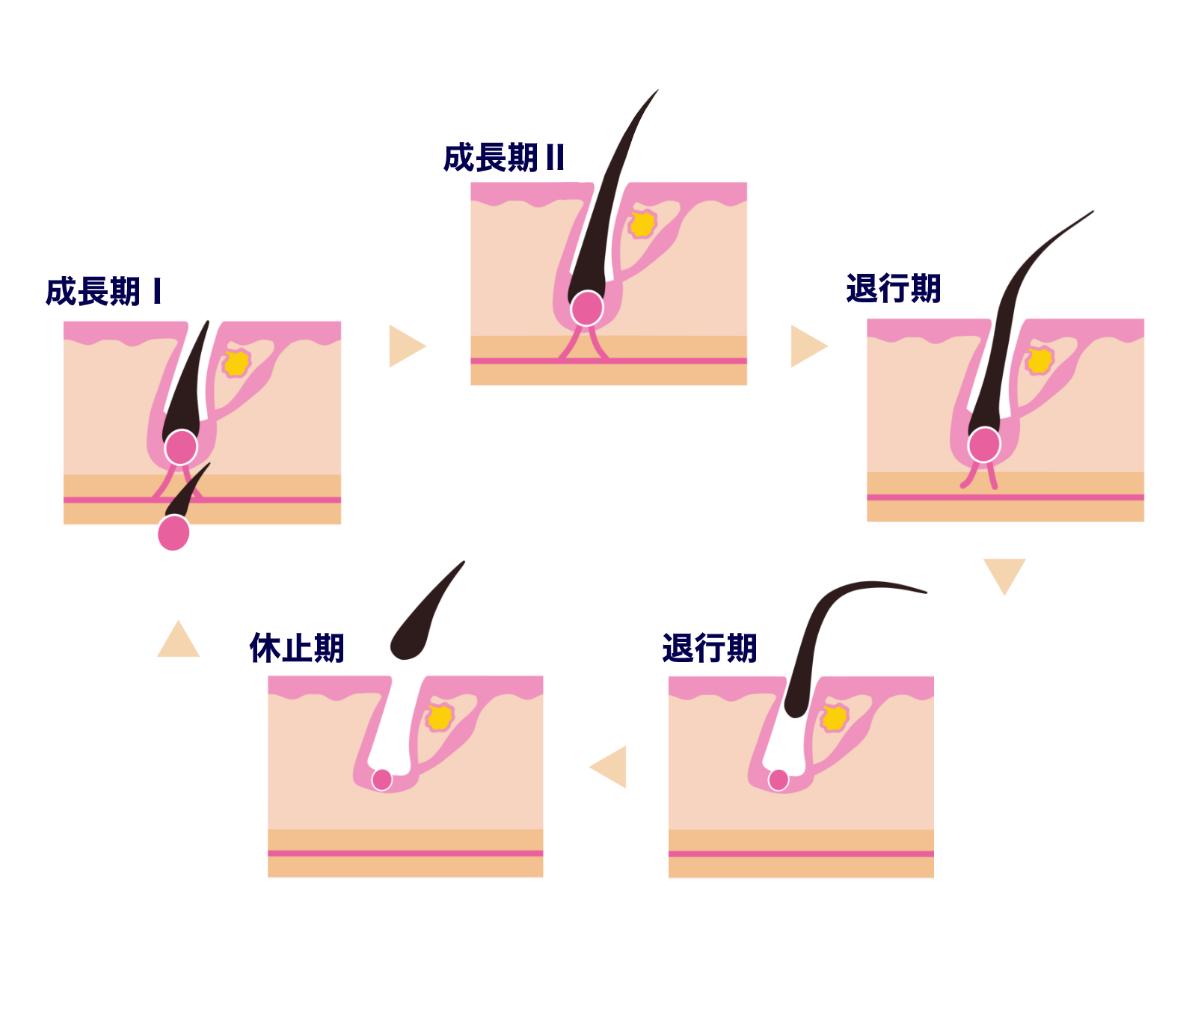 【AGA基礎知識】薄毛対策はヘアサイクル(毛周期)の仕組みを知ることから